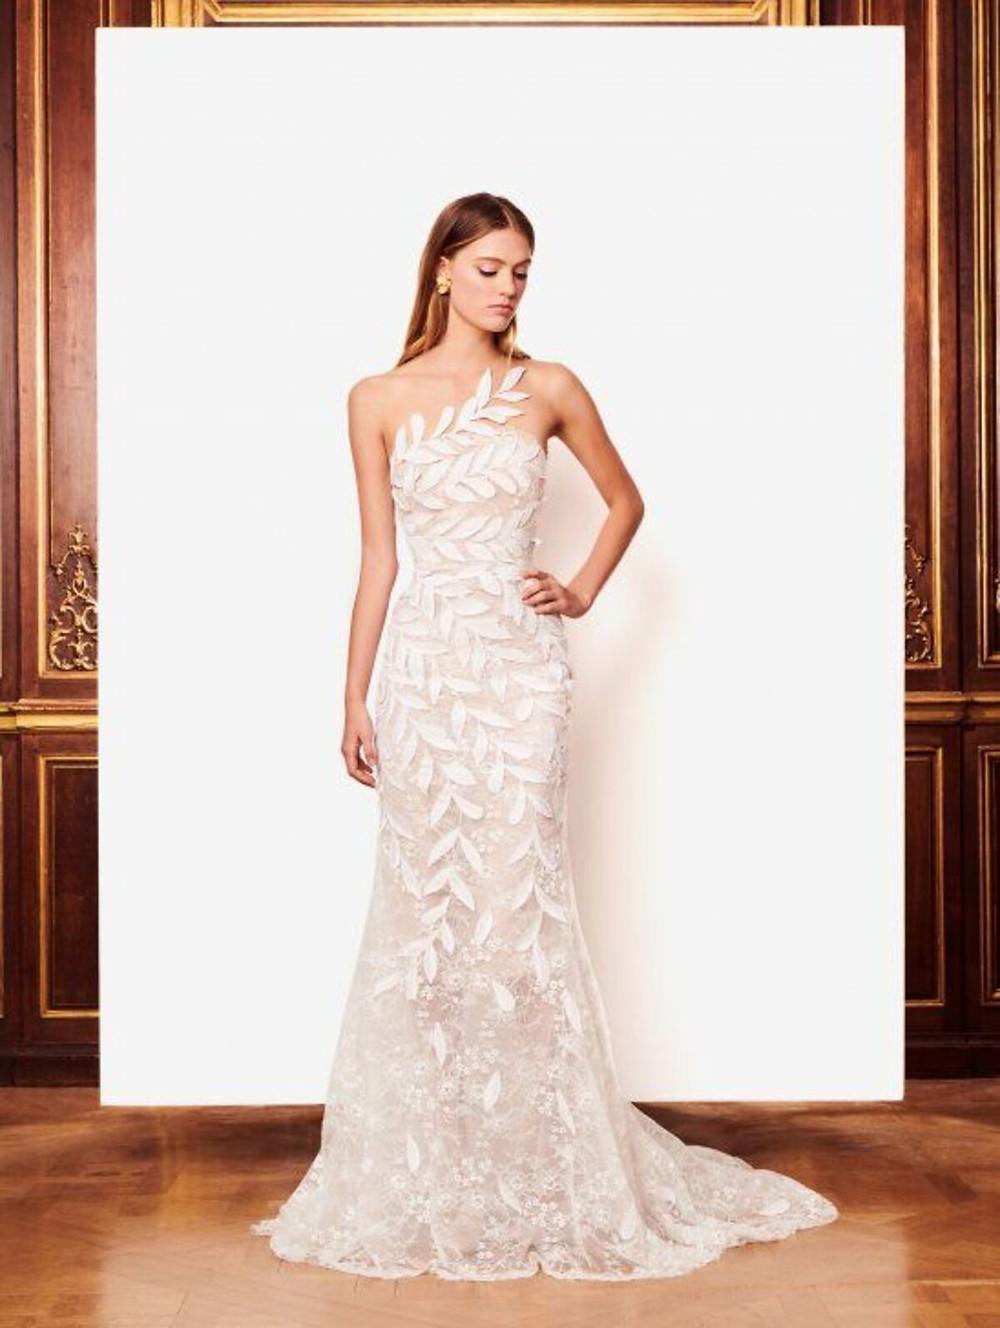 A one shoulder, mermaid wedding dress with leaf print and embellishments